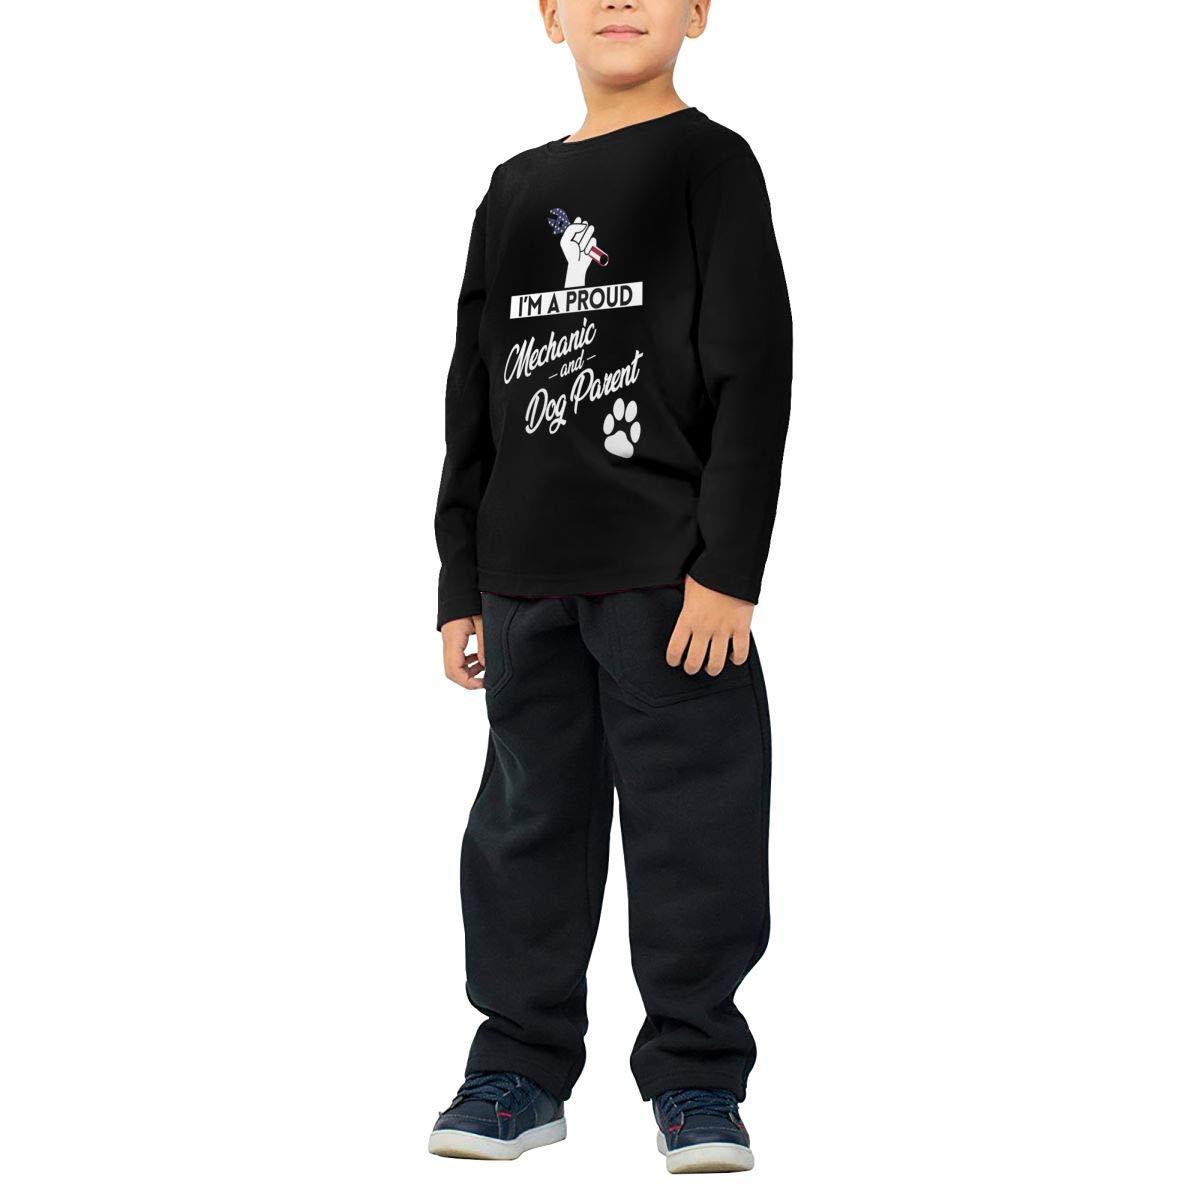 Proud Mechanic and Dog Parent Childrens Long Sleeve T-Shirt Boys Cotton Tee Tops